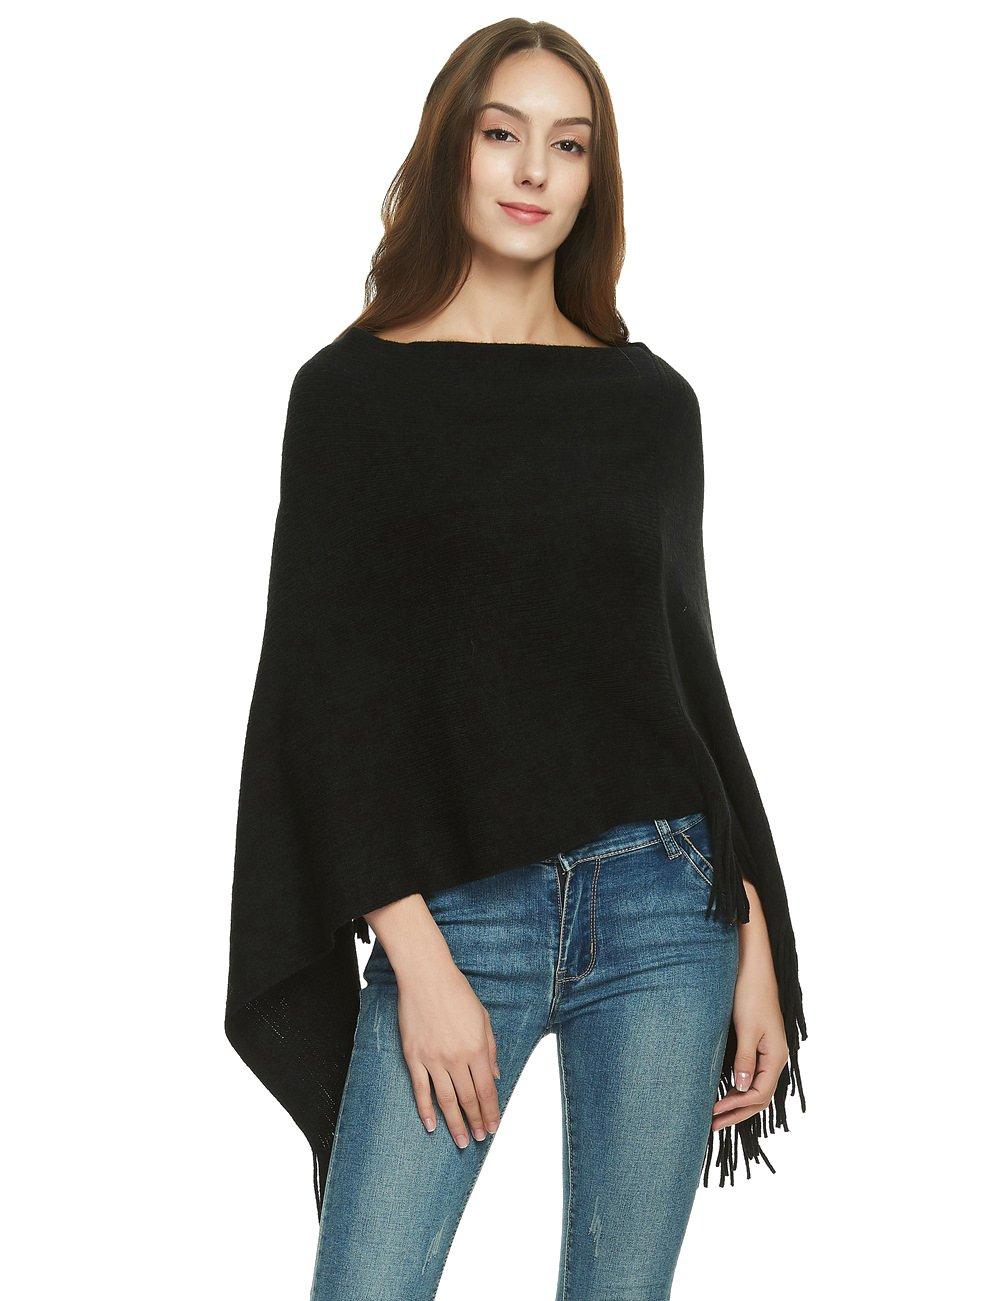 Ferand Women\'s Elegant Knit Poncho Sweater Soft Wrap Shawl Black